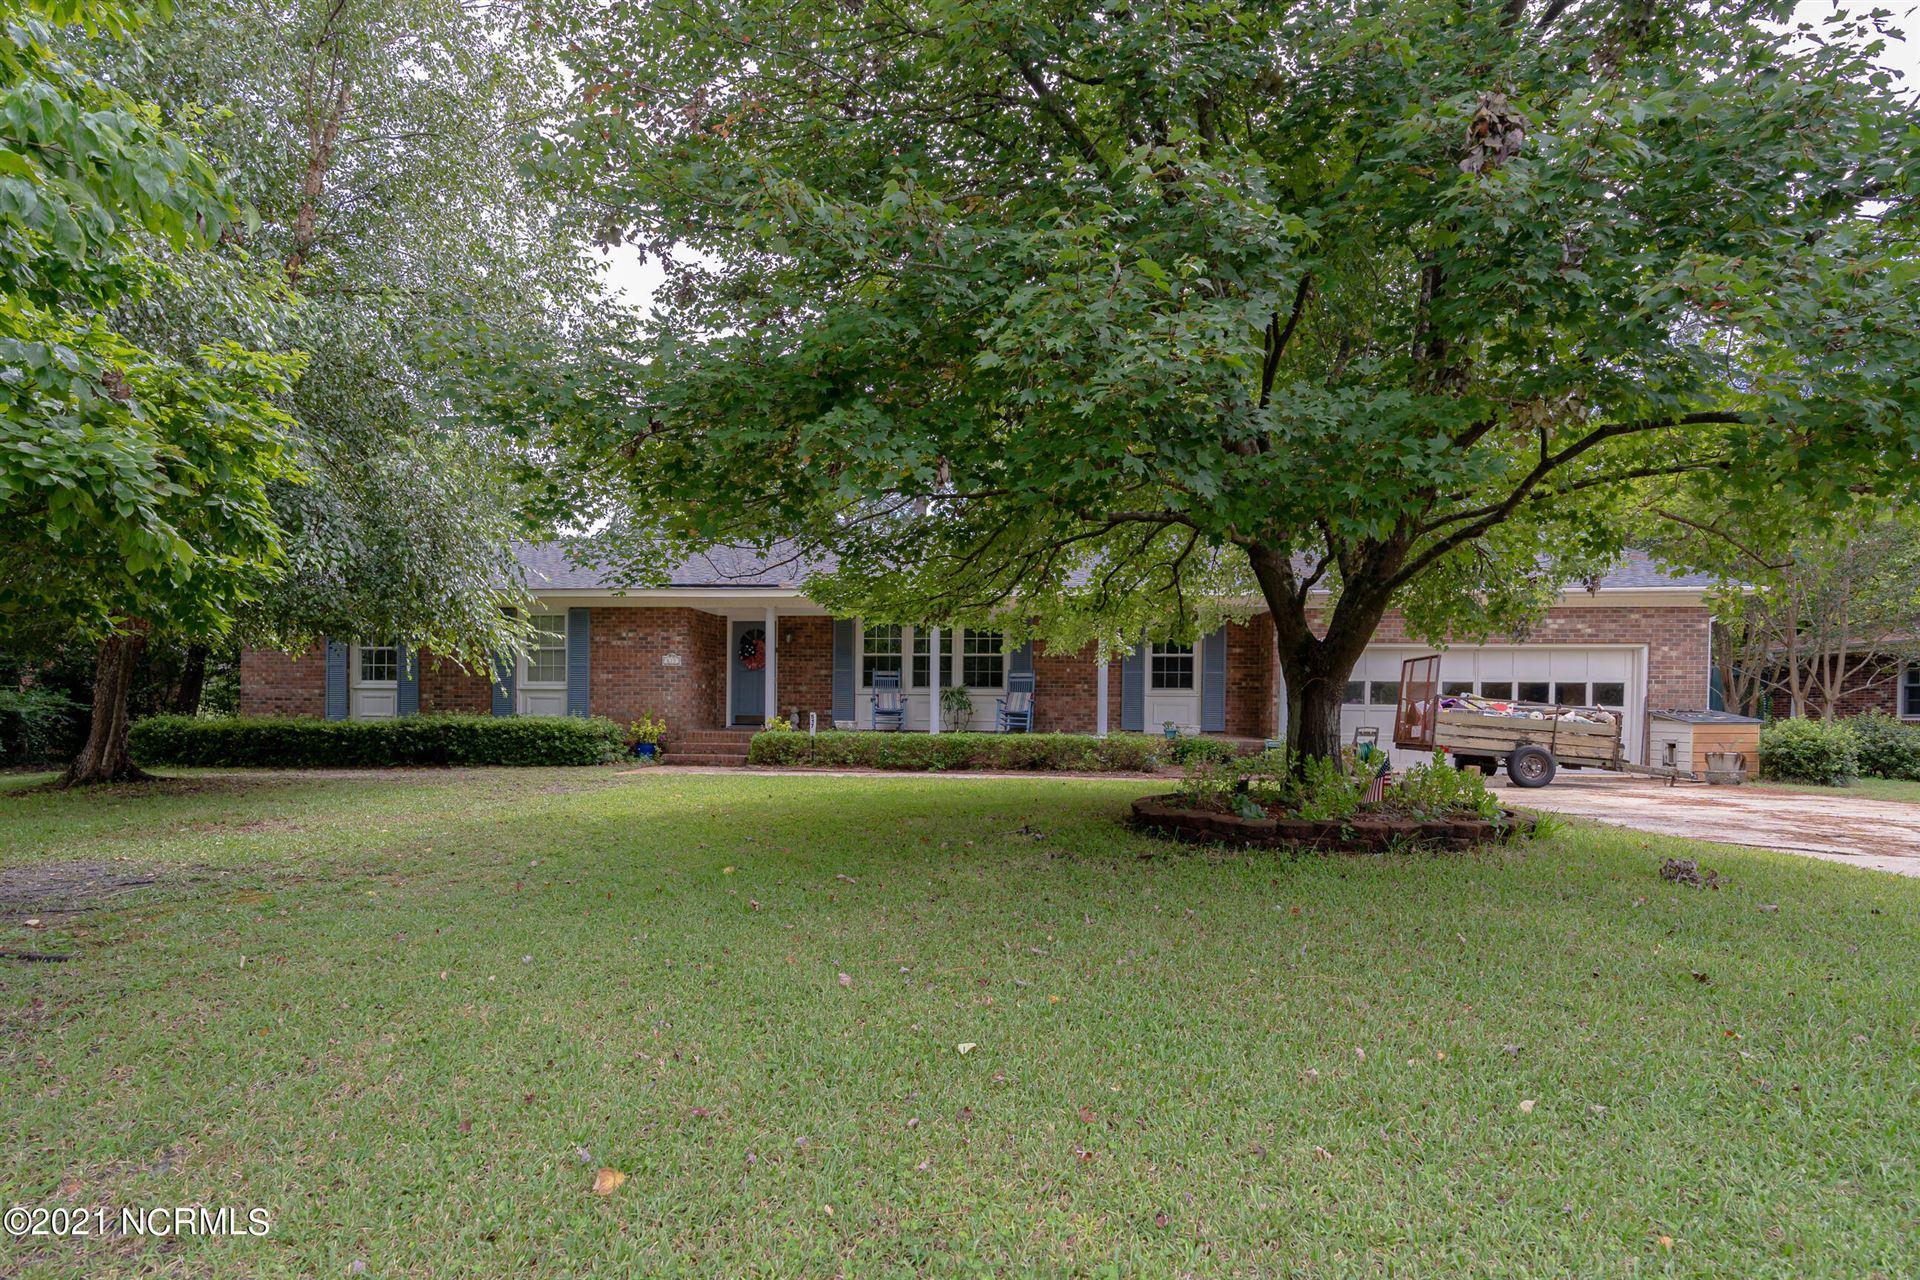 Photo of 517 Baytree Road, Wilmington, NC 28409 (MLS # 100288713)